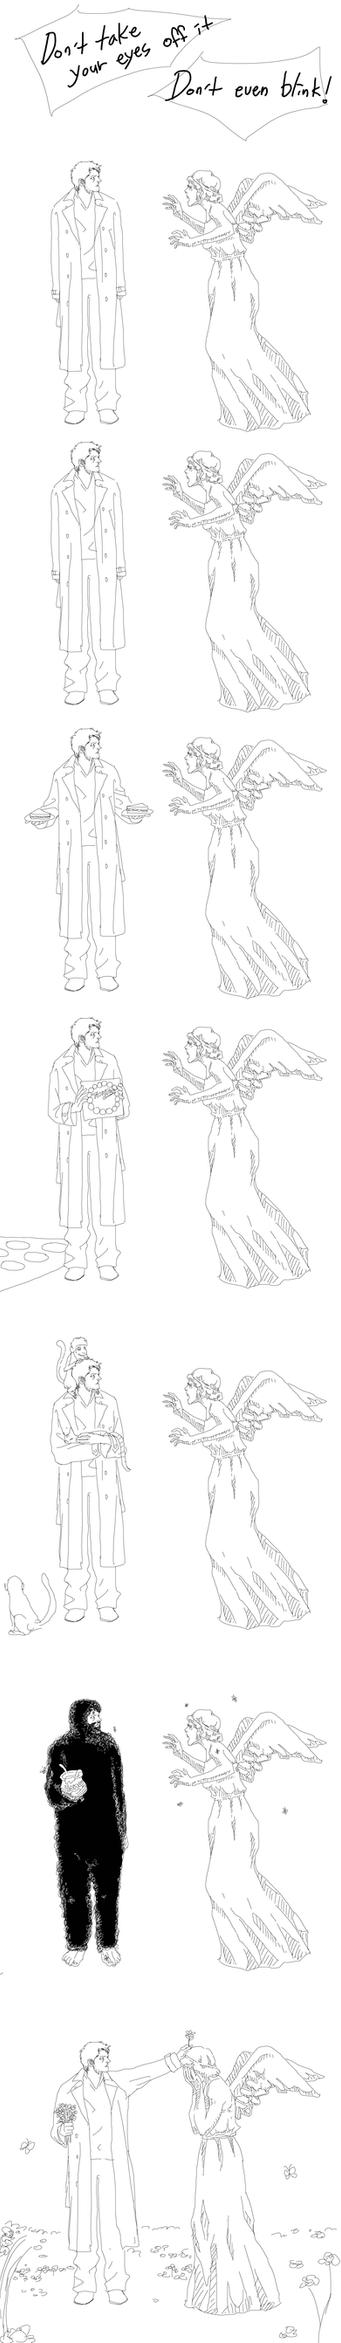 Castiel vs Weeping Angel by sweetdari